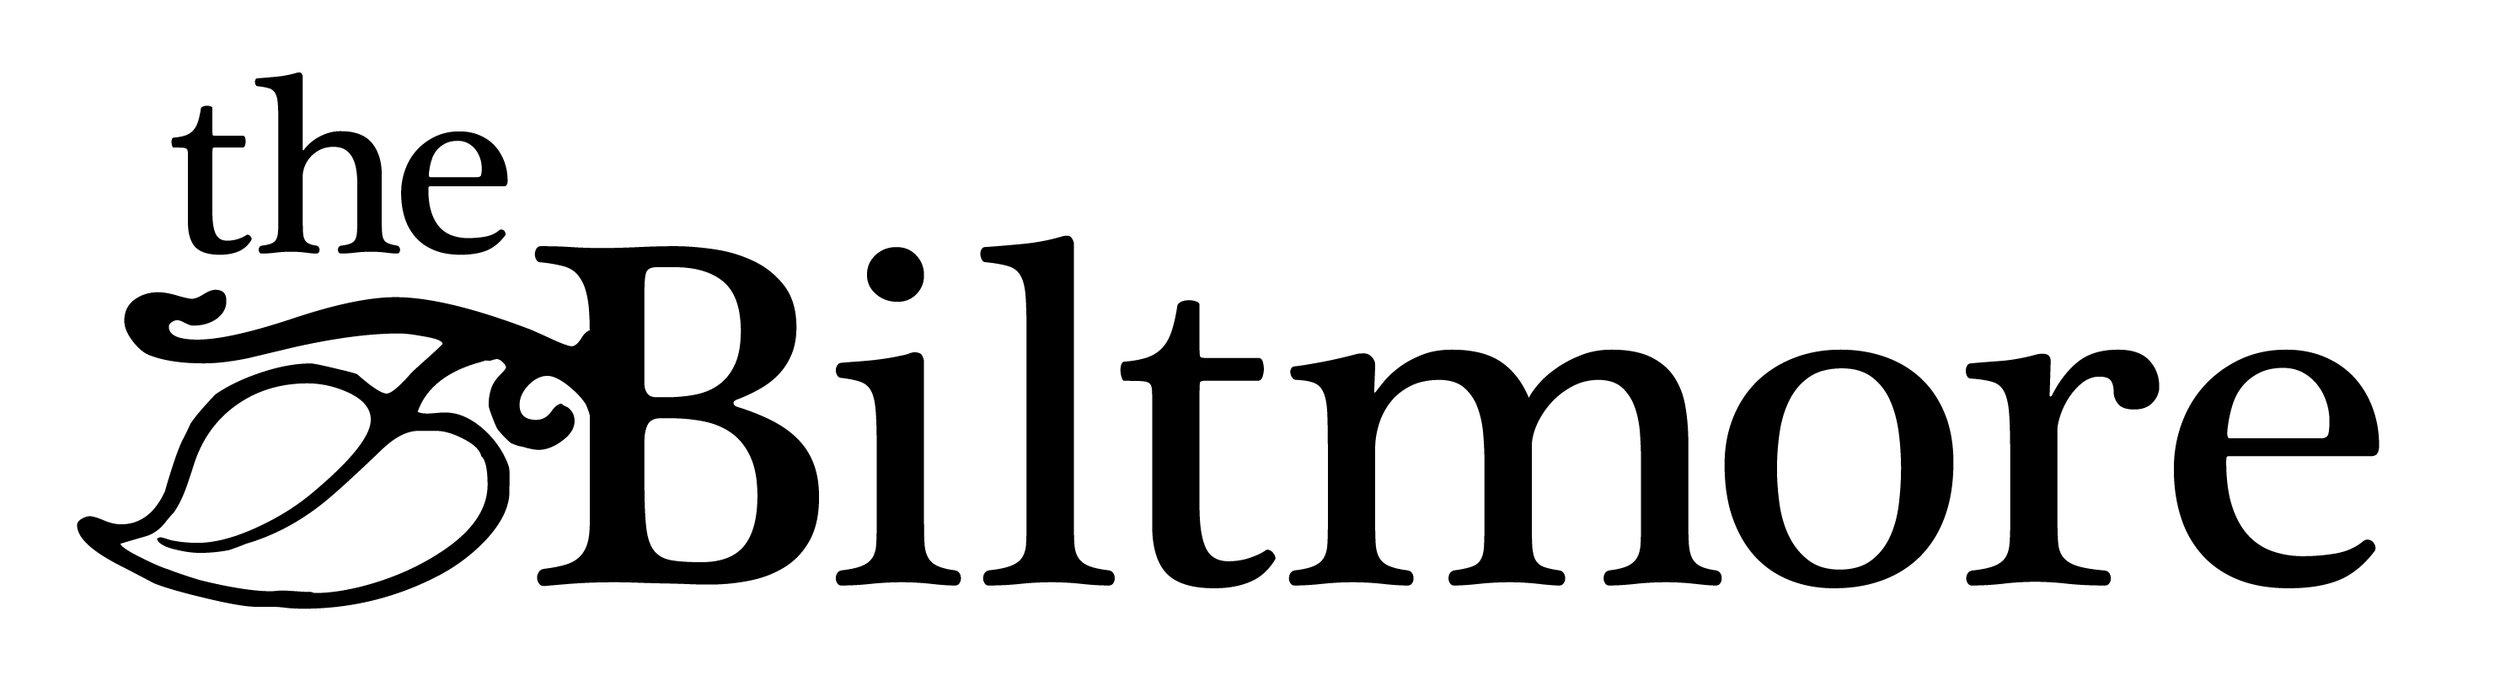 TheBiltmore_logo.jpg